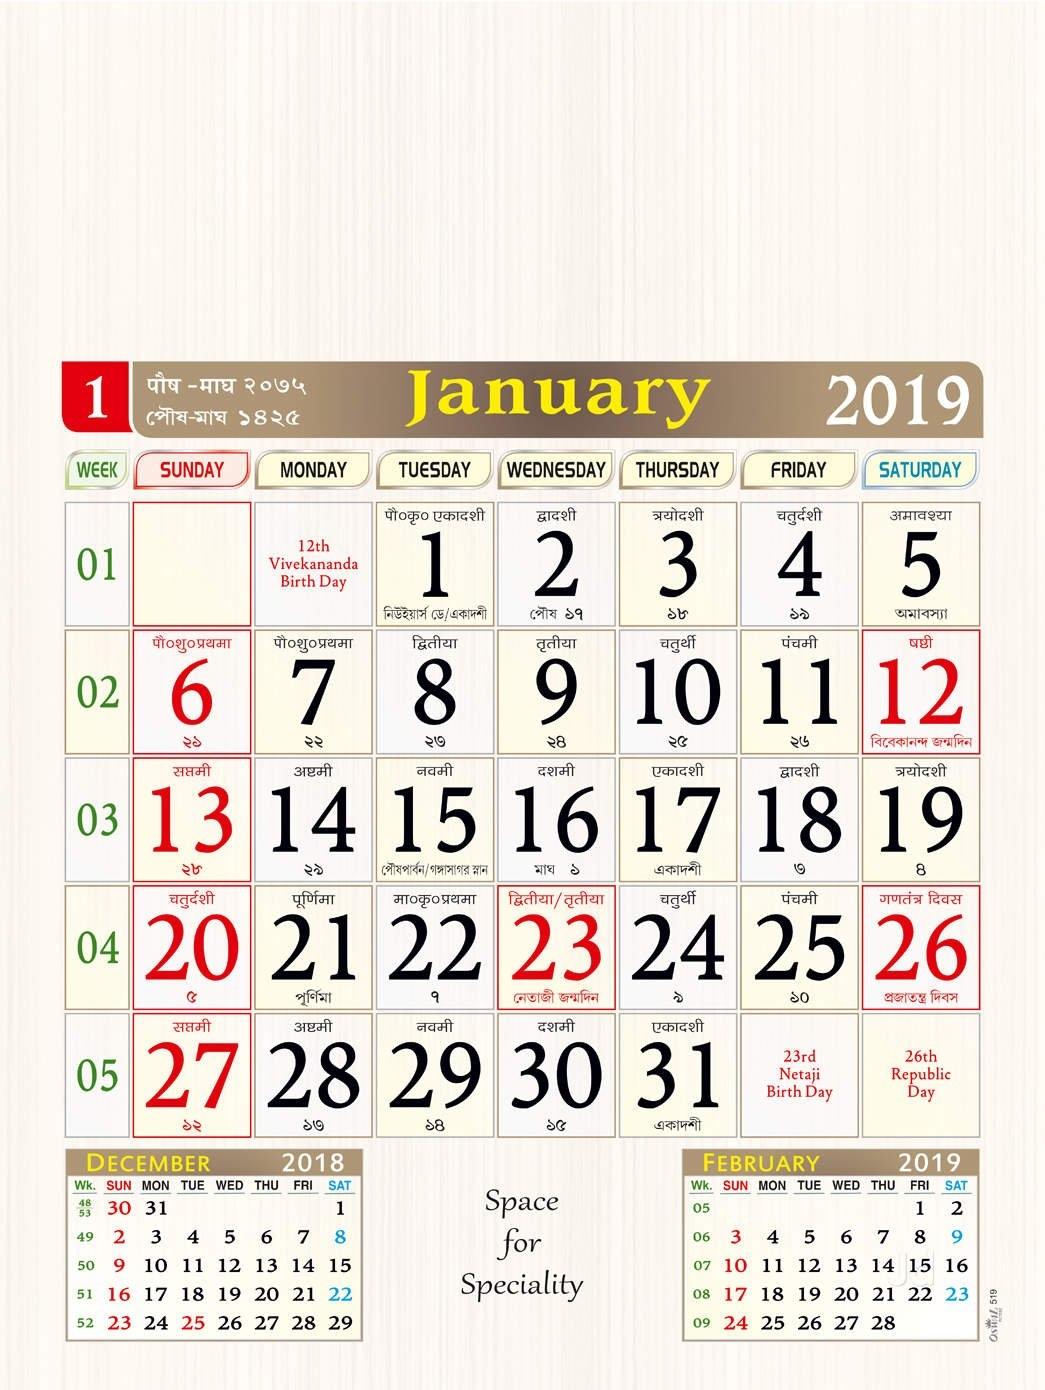 Oswal Calendar Enterprises Photos, Burrabazar, Kolkata- Pictures Calendar 2019 Kolkata